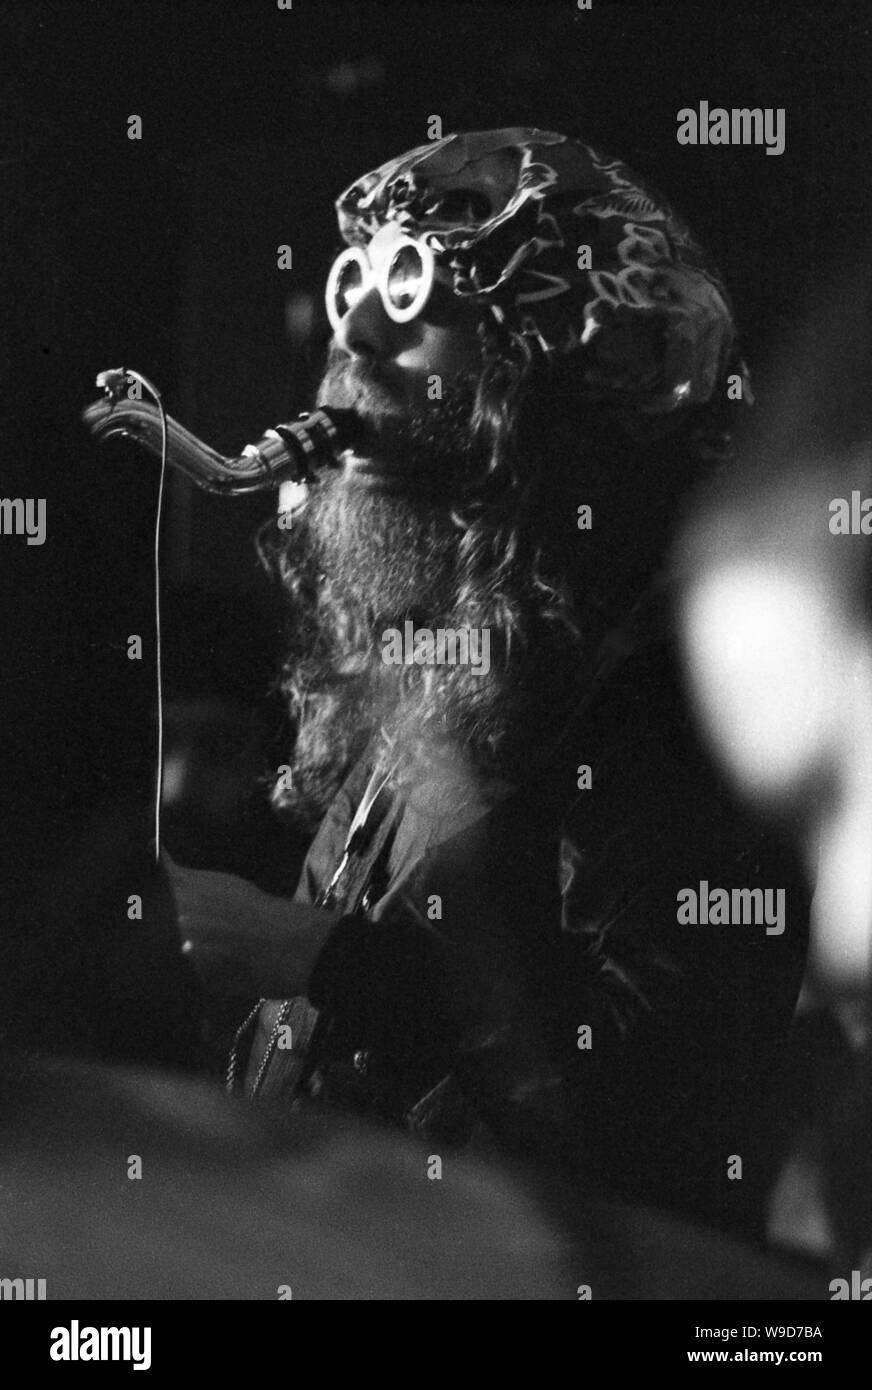 The Mascara Snake at the Amougies Festival, October 24-28, 1969 Stock Photo